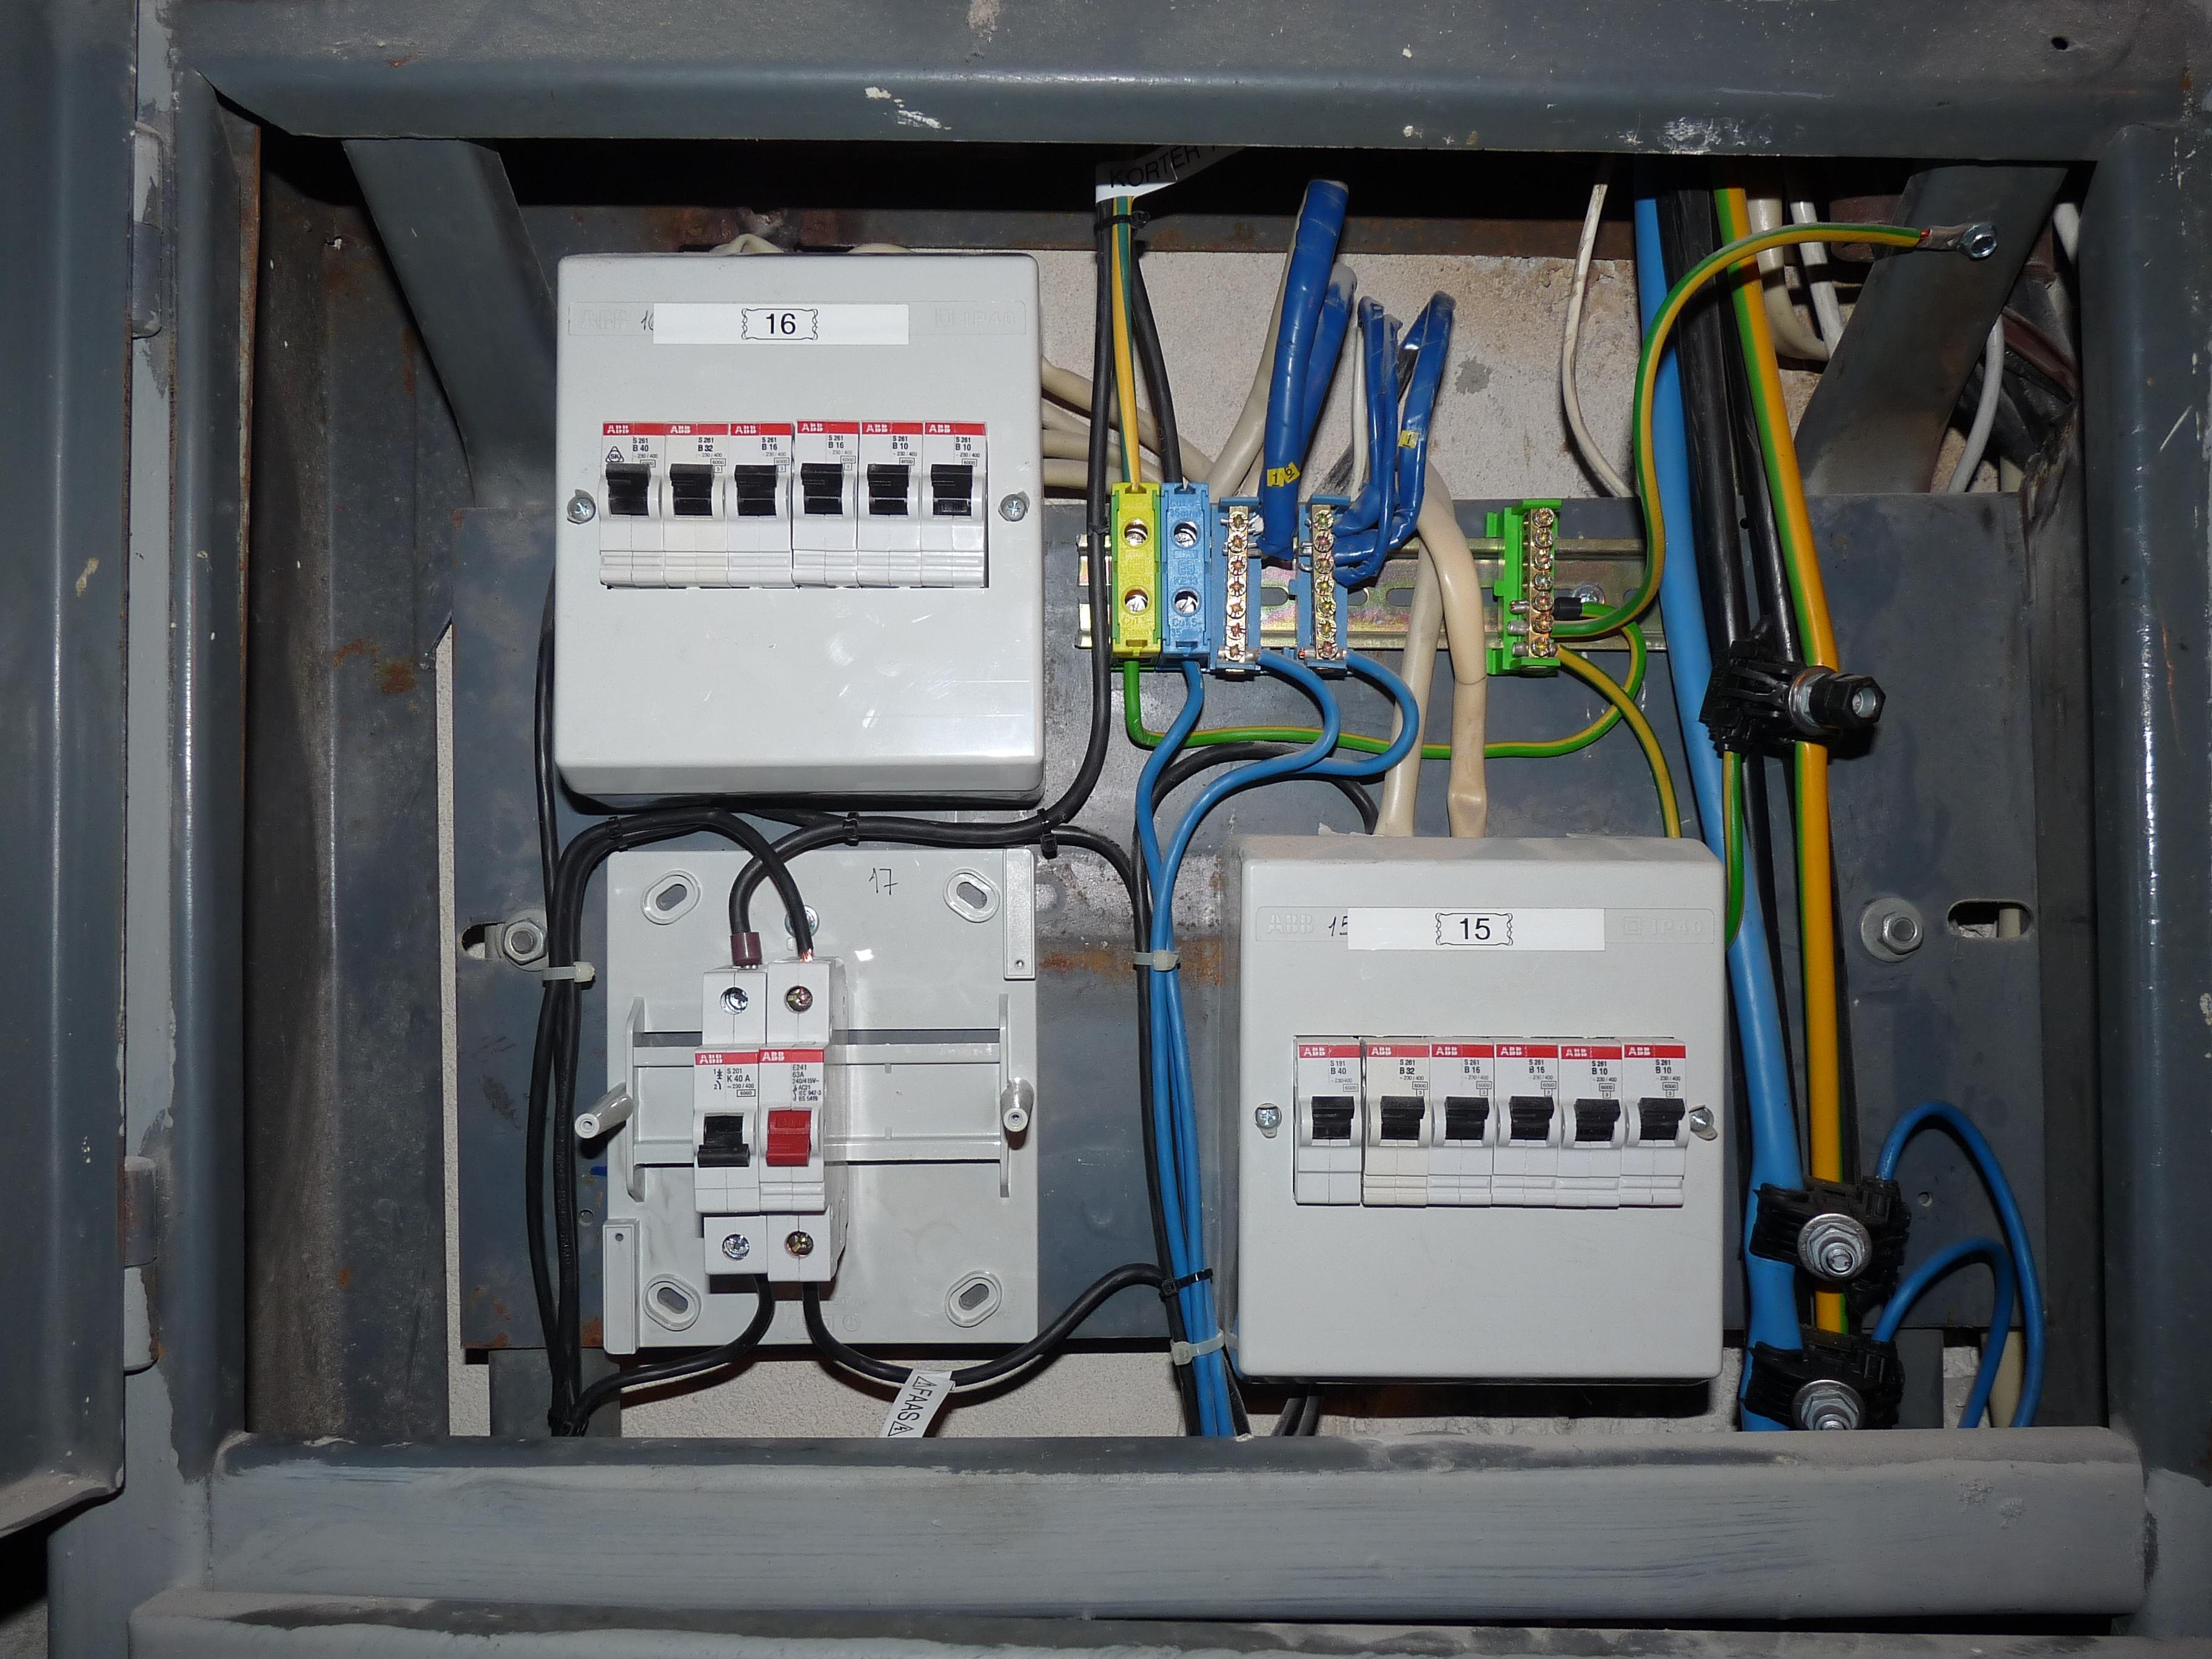 file kolde 100 17 rewiring of electricity meter jpg wikimedia commons rh commons wikimedia org